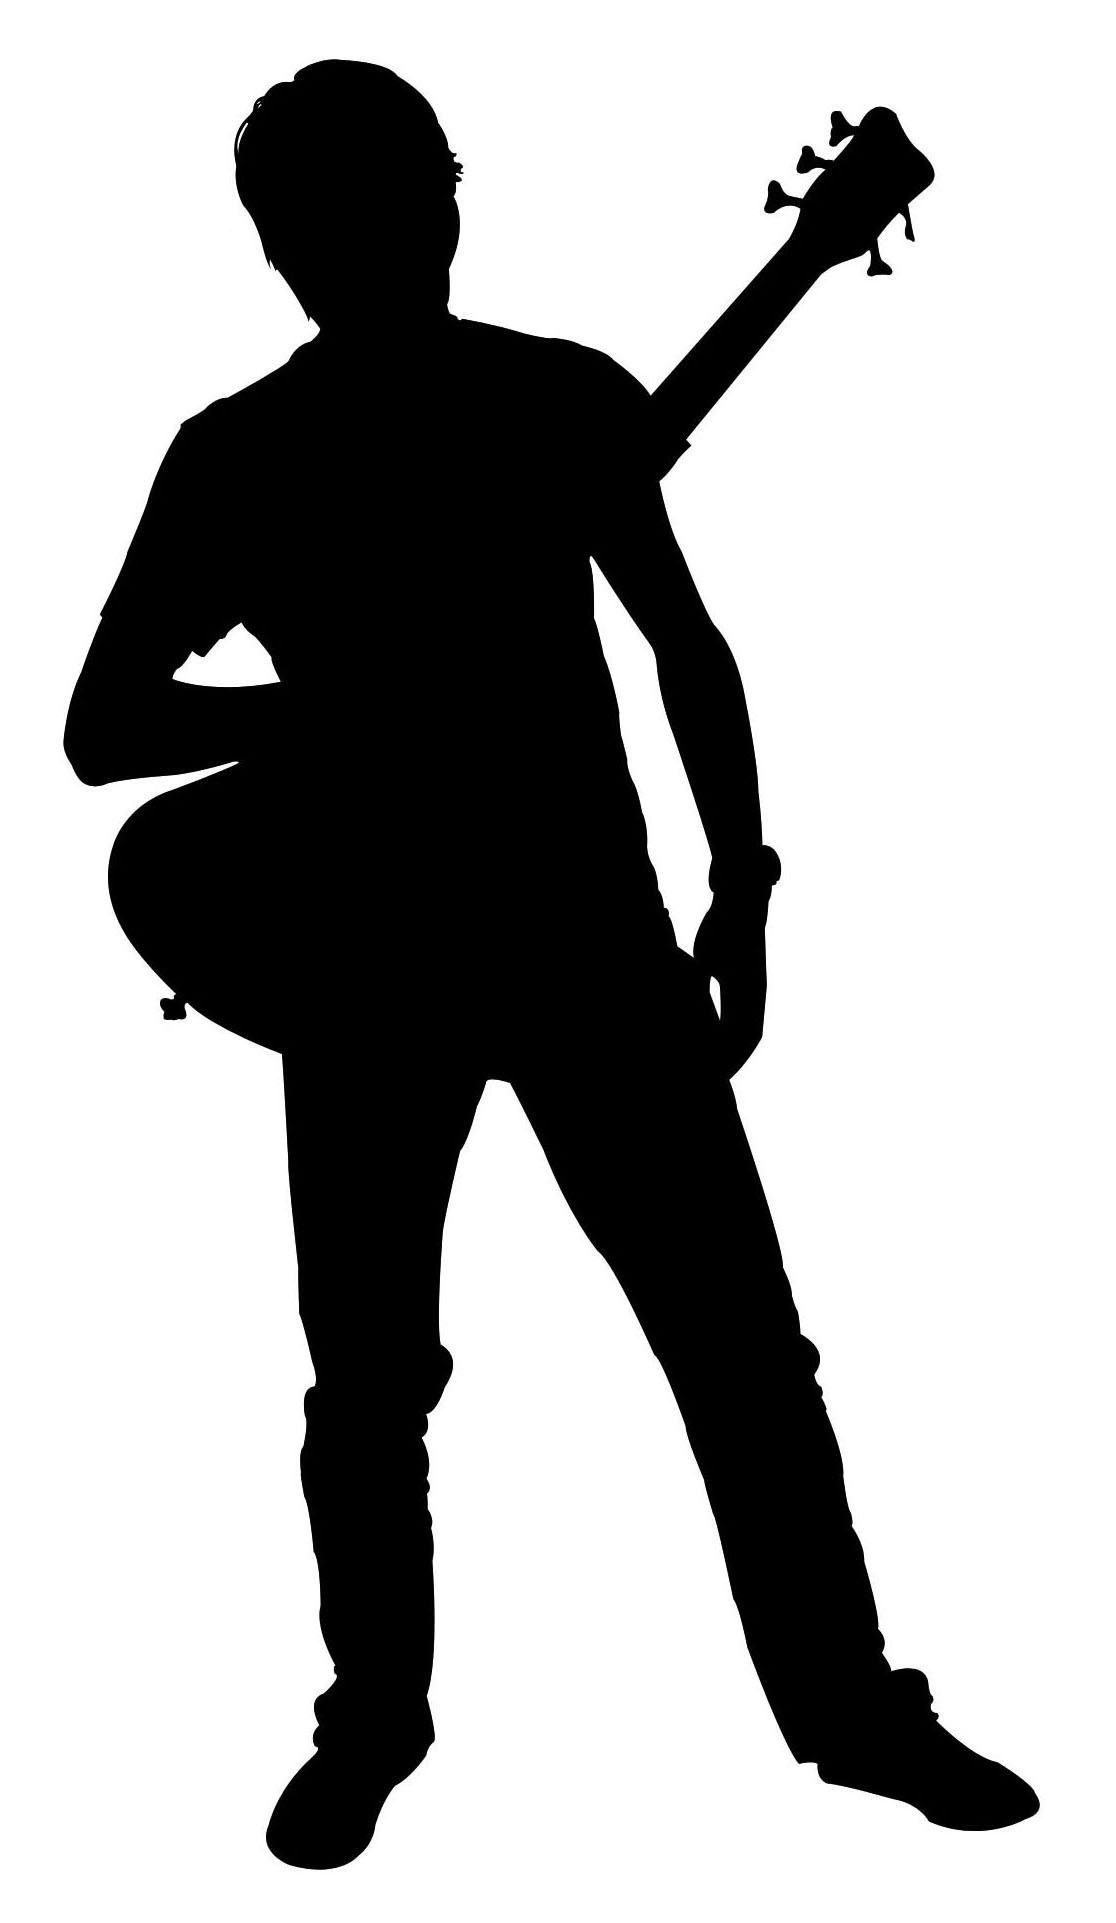 File:Band Silhouette 06.jpg